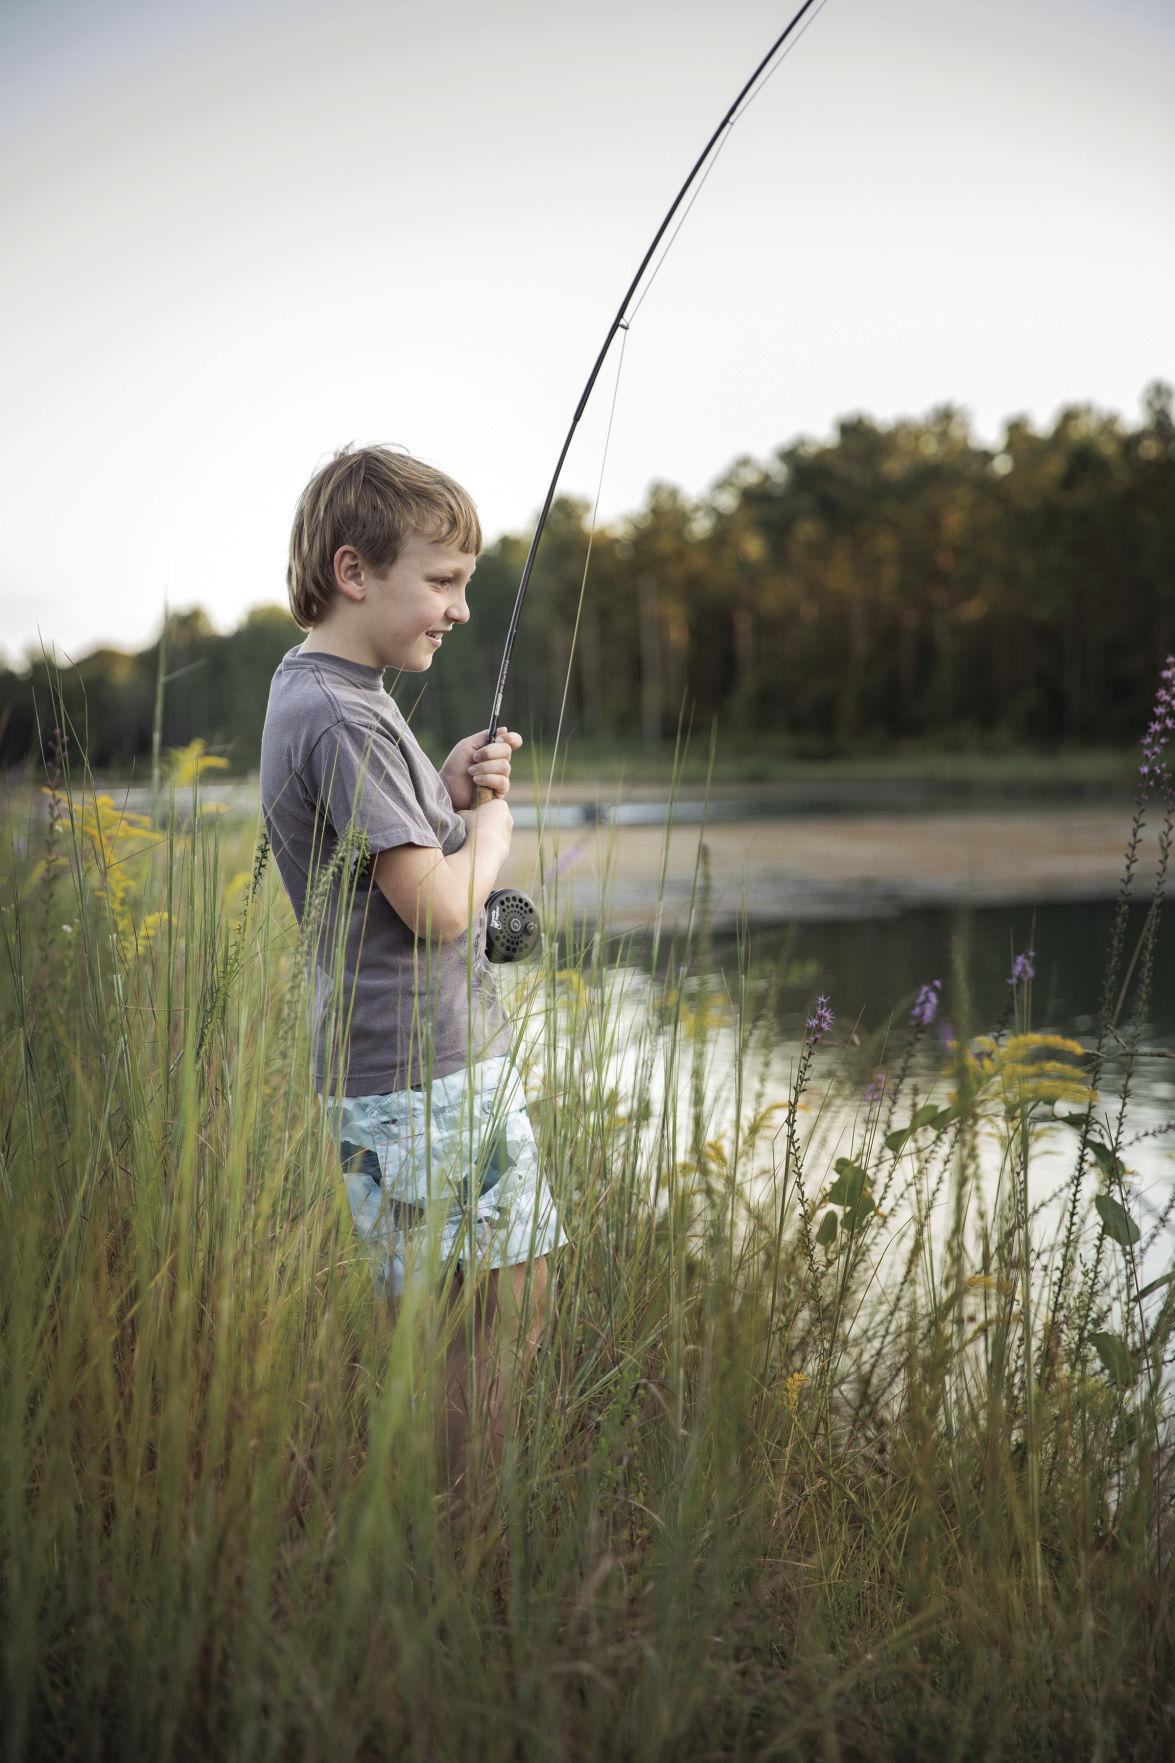 Boy Fishing_CMYK.jpg